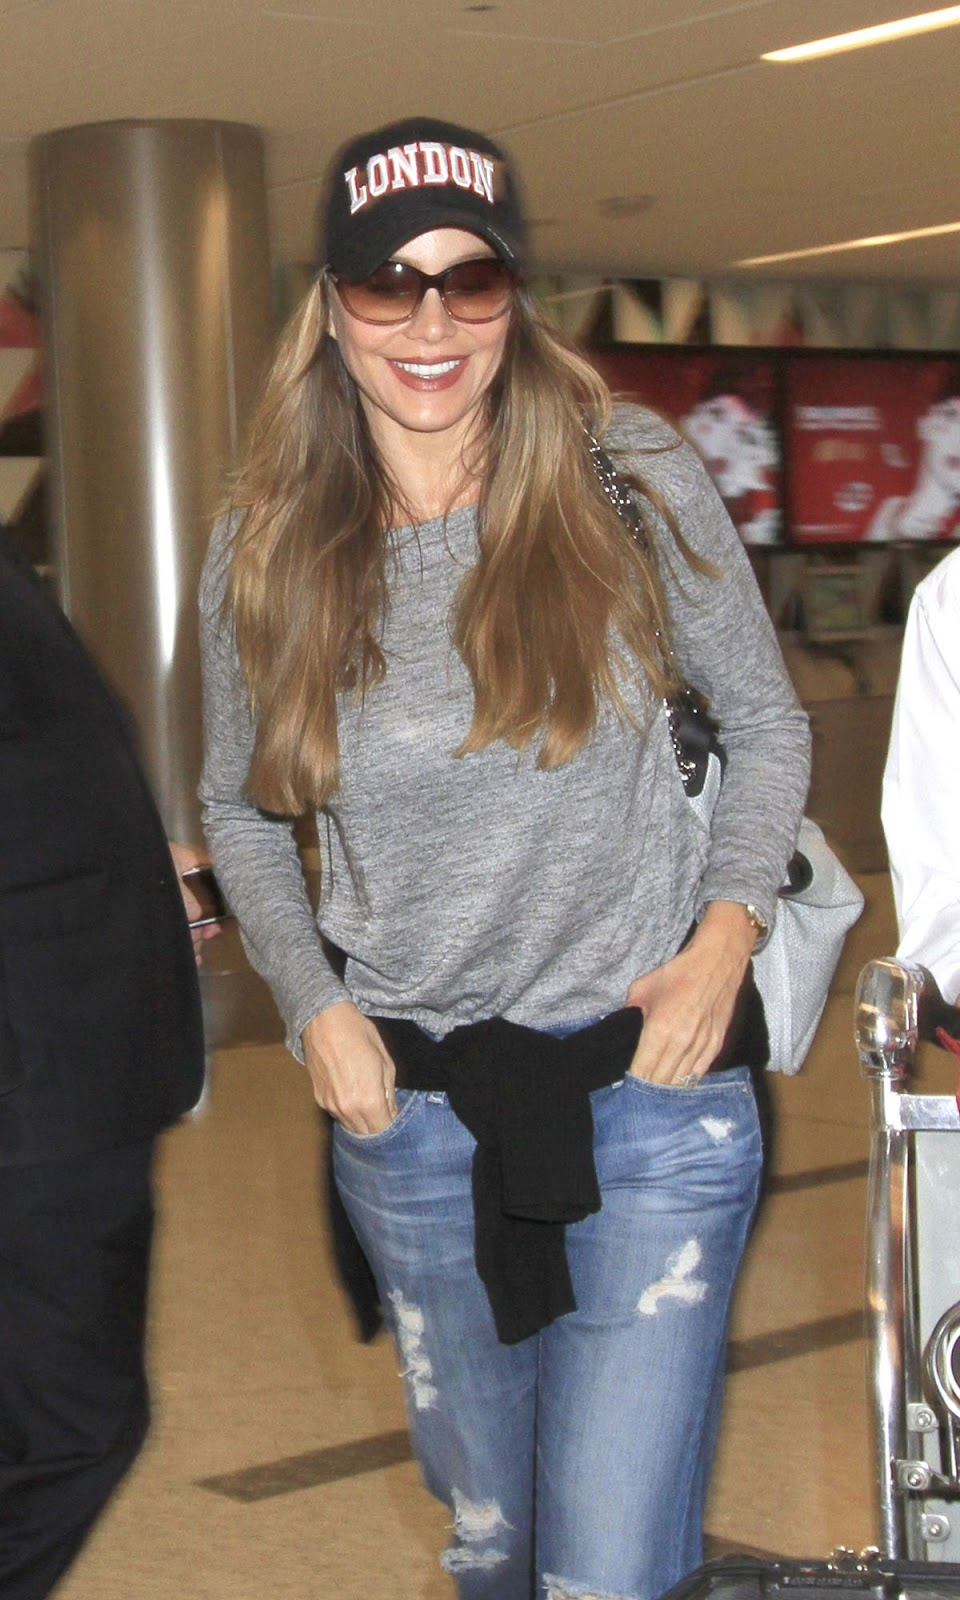 HD Photos of Sofia Vergara At Los Angeles International Airport